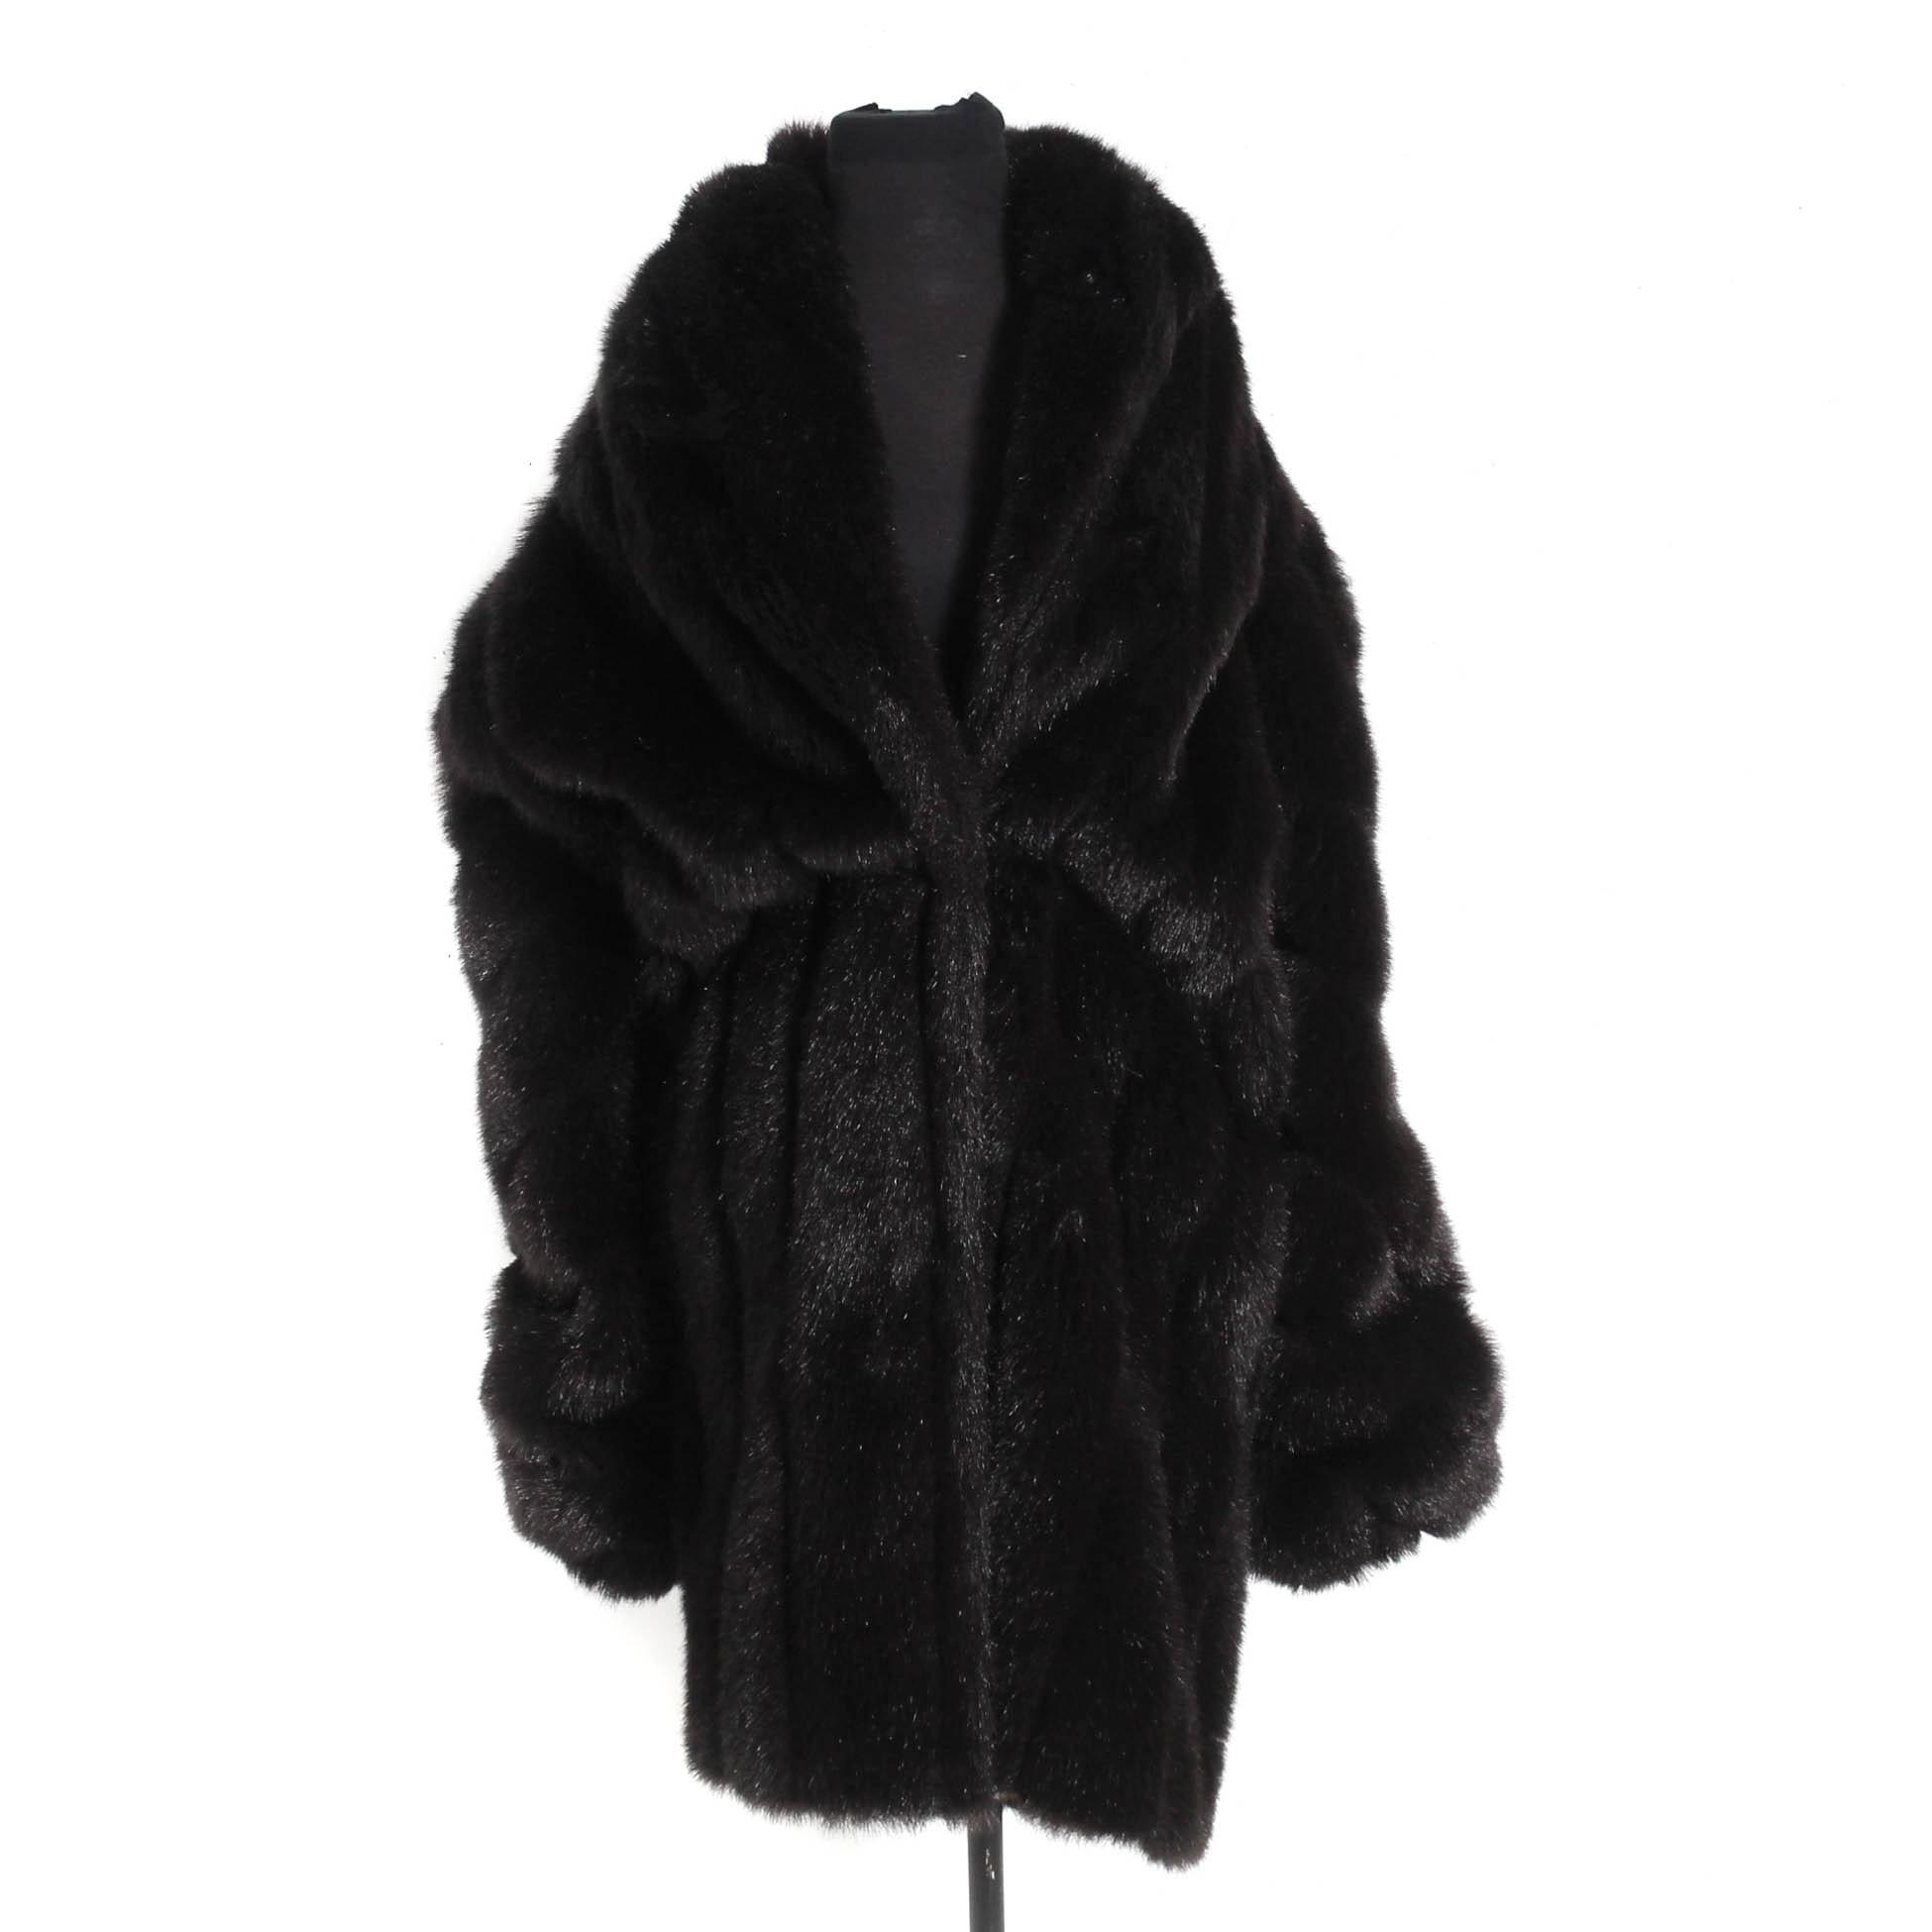 Monterey Fashions Faux Fur Jacket